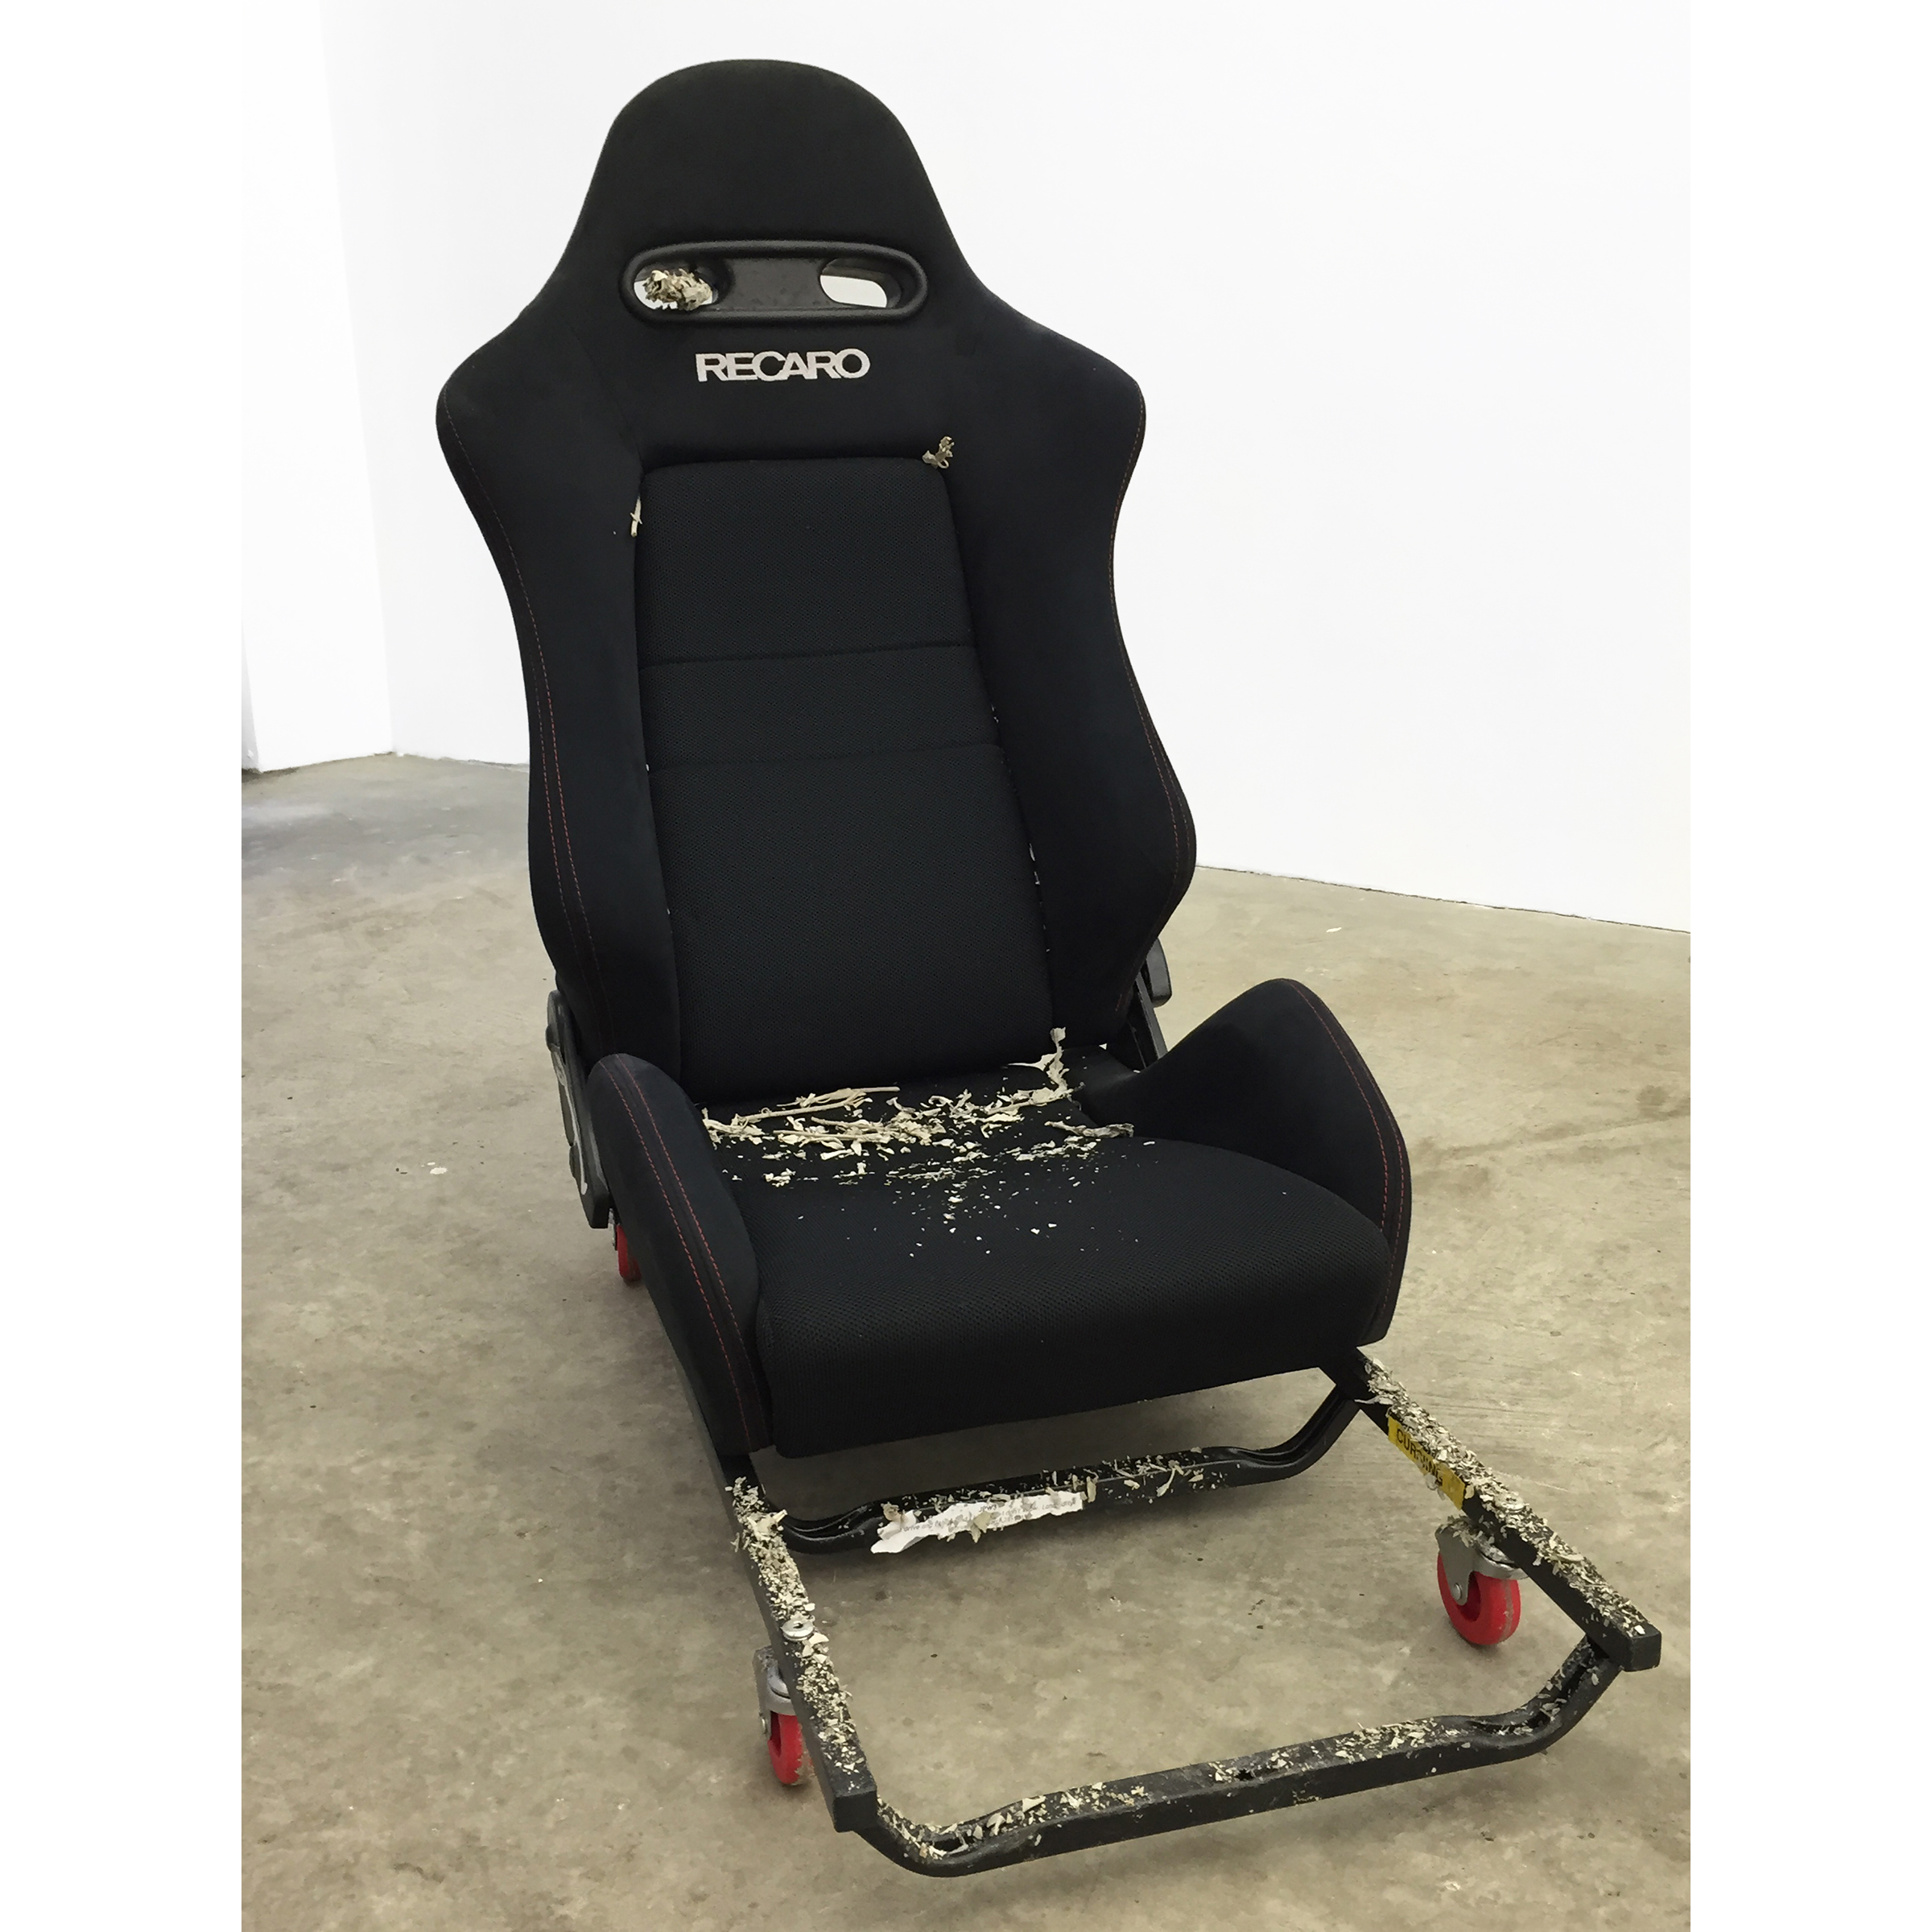 JPW3, RECARO Wheely Chair 2 , 2015,RECARO car seat, rolling carts, sage,42 x 37 x 19 in